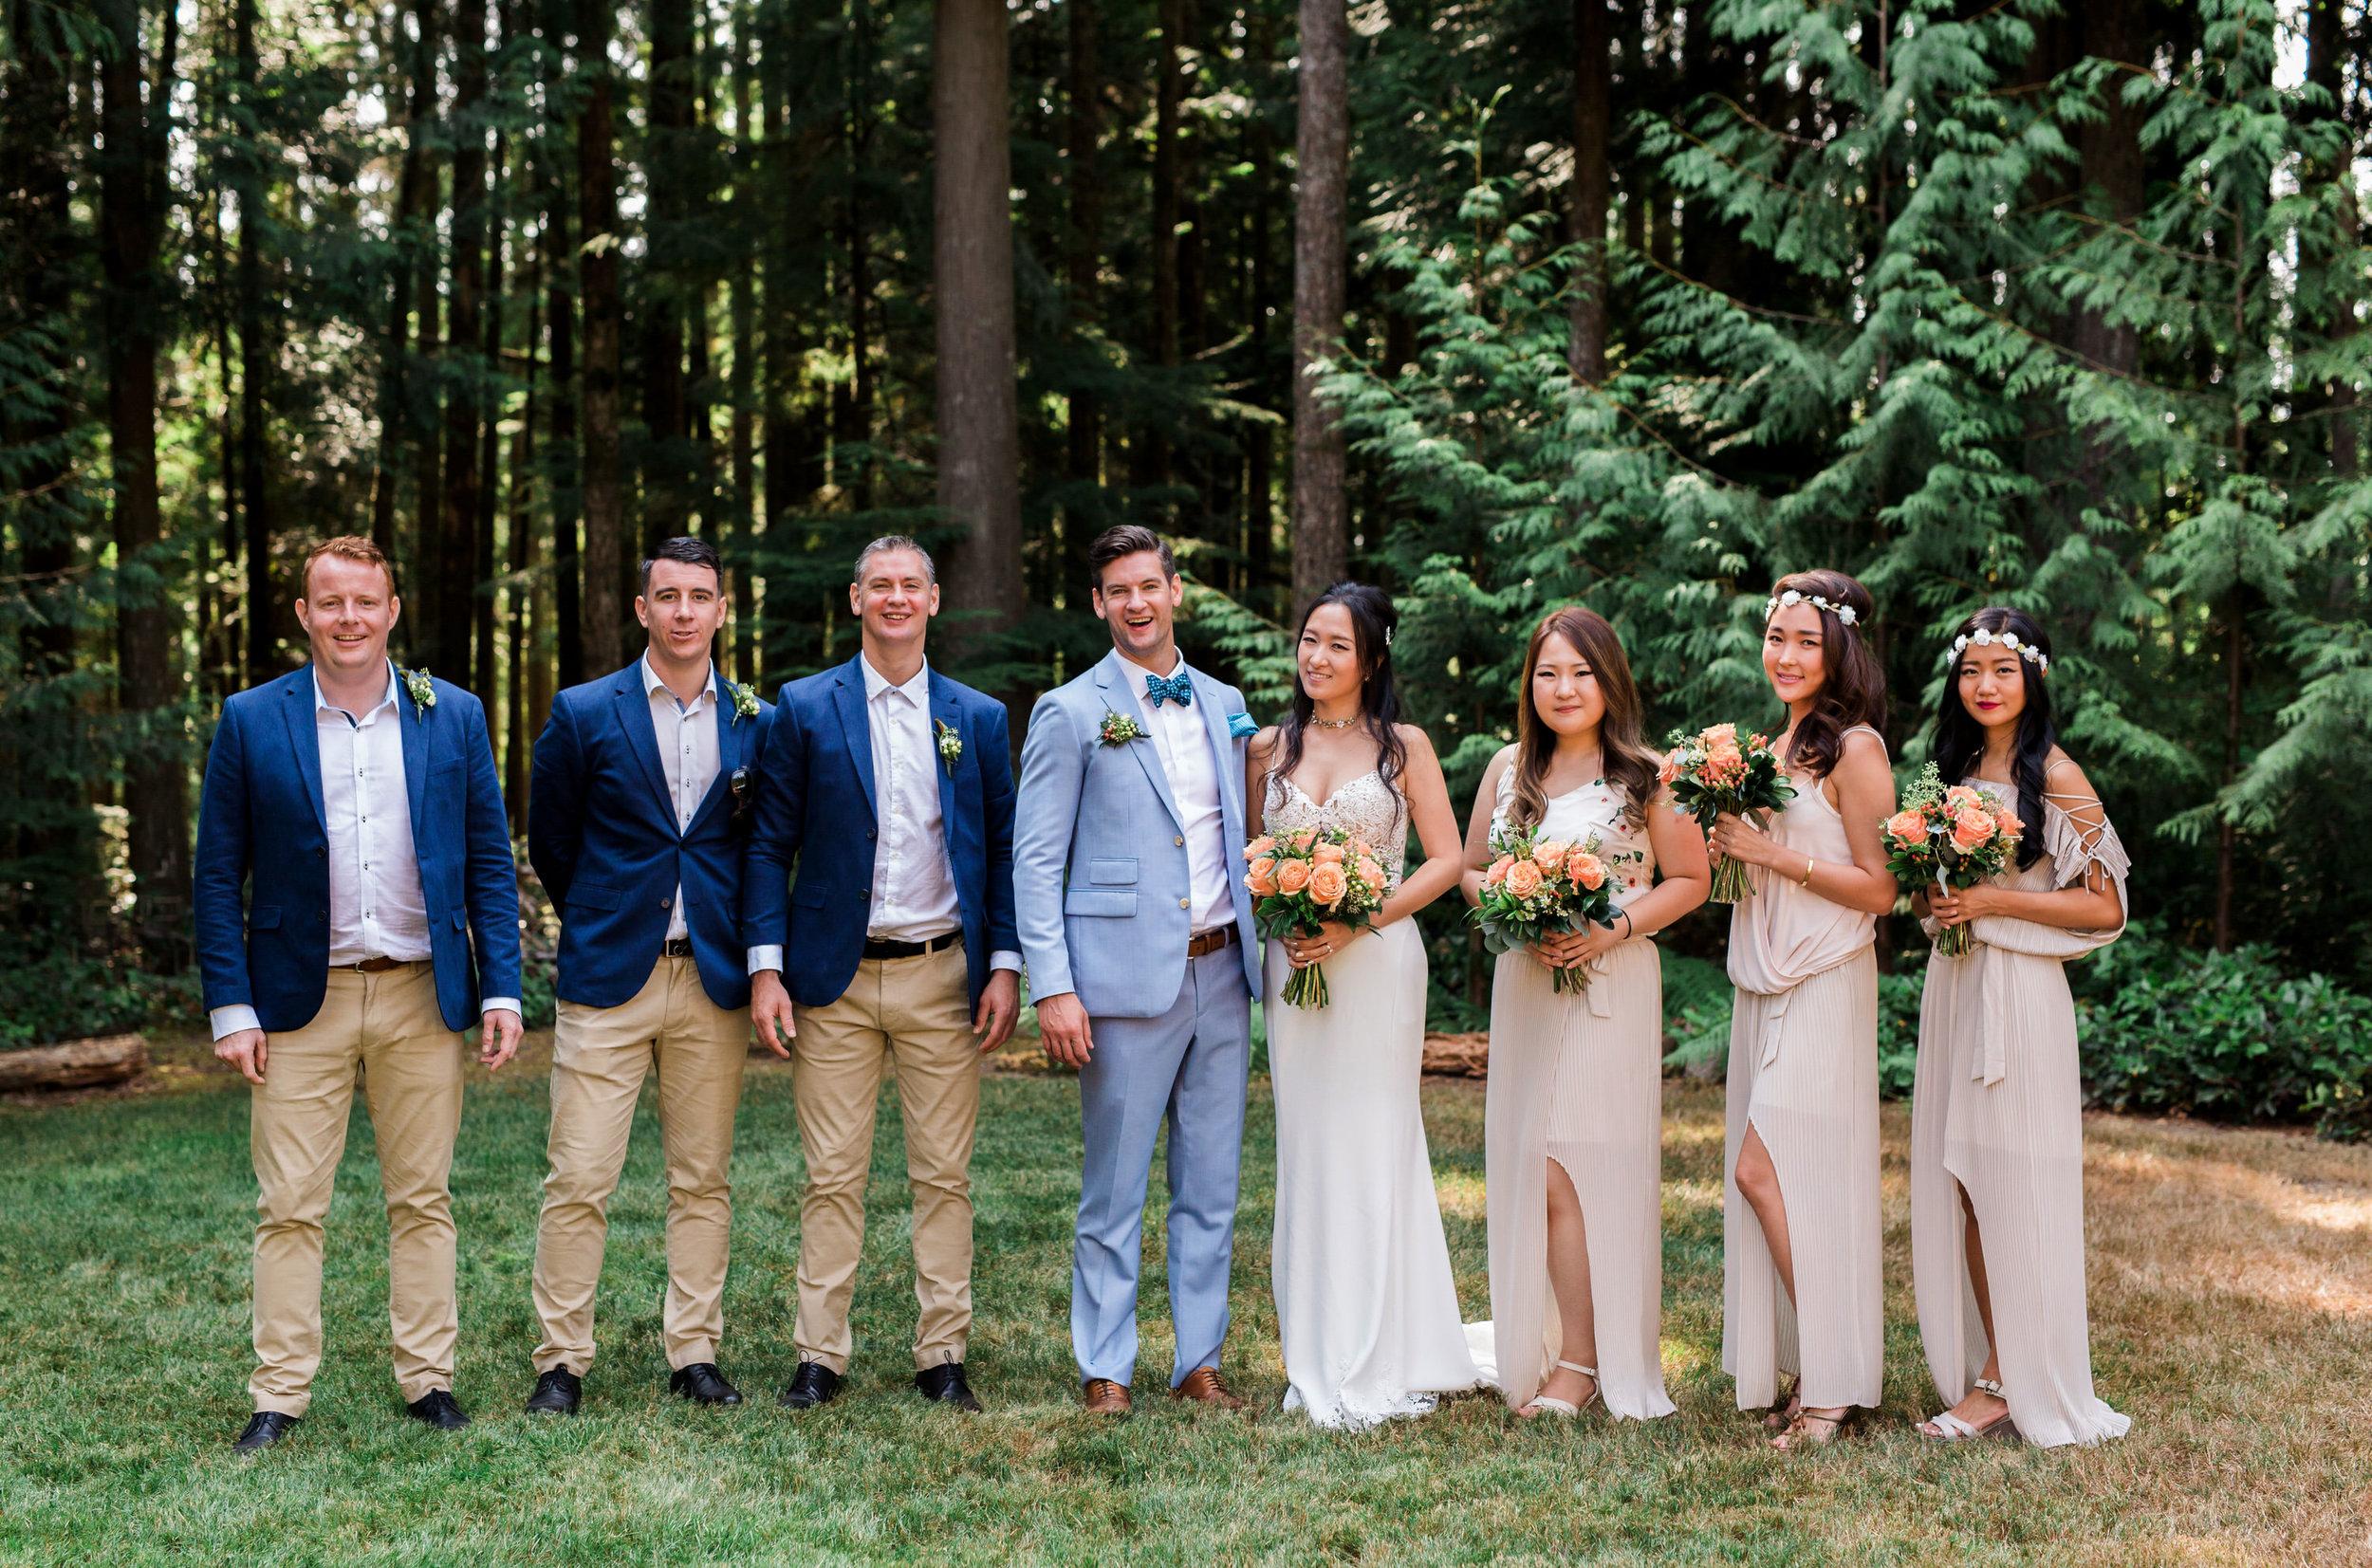 Linwood House Wedding Photos - Roberts Creek Wedding Photos - Vancouver Wedding Photographer & Videographer - Sunshine Coast Wedding Photos - Sunshine Coast Wedding Photographer - Jennifer Picard Photography - IMG_7104.jpg